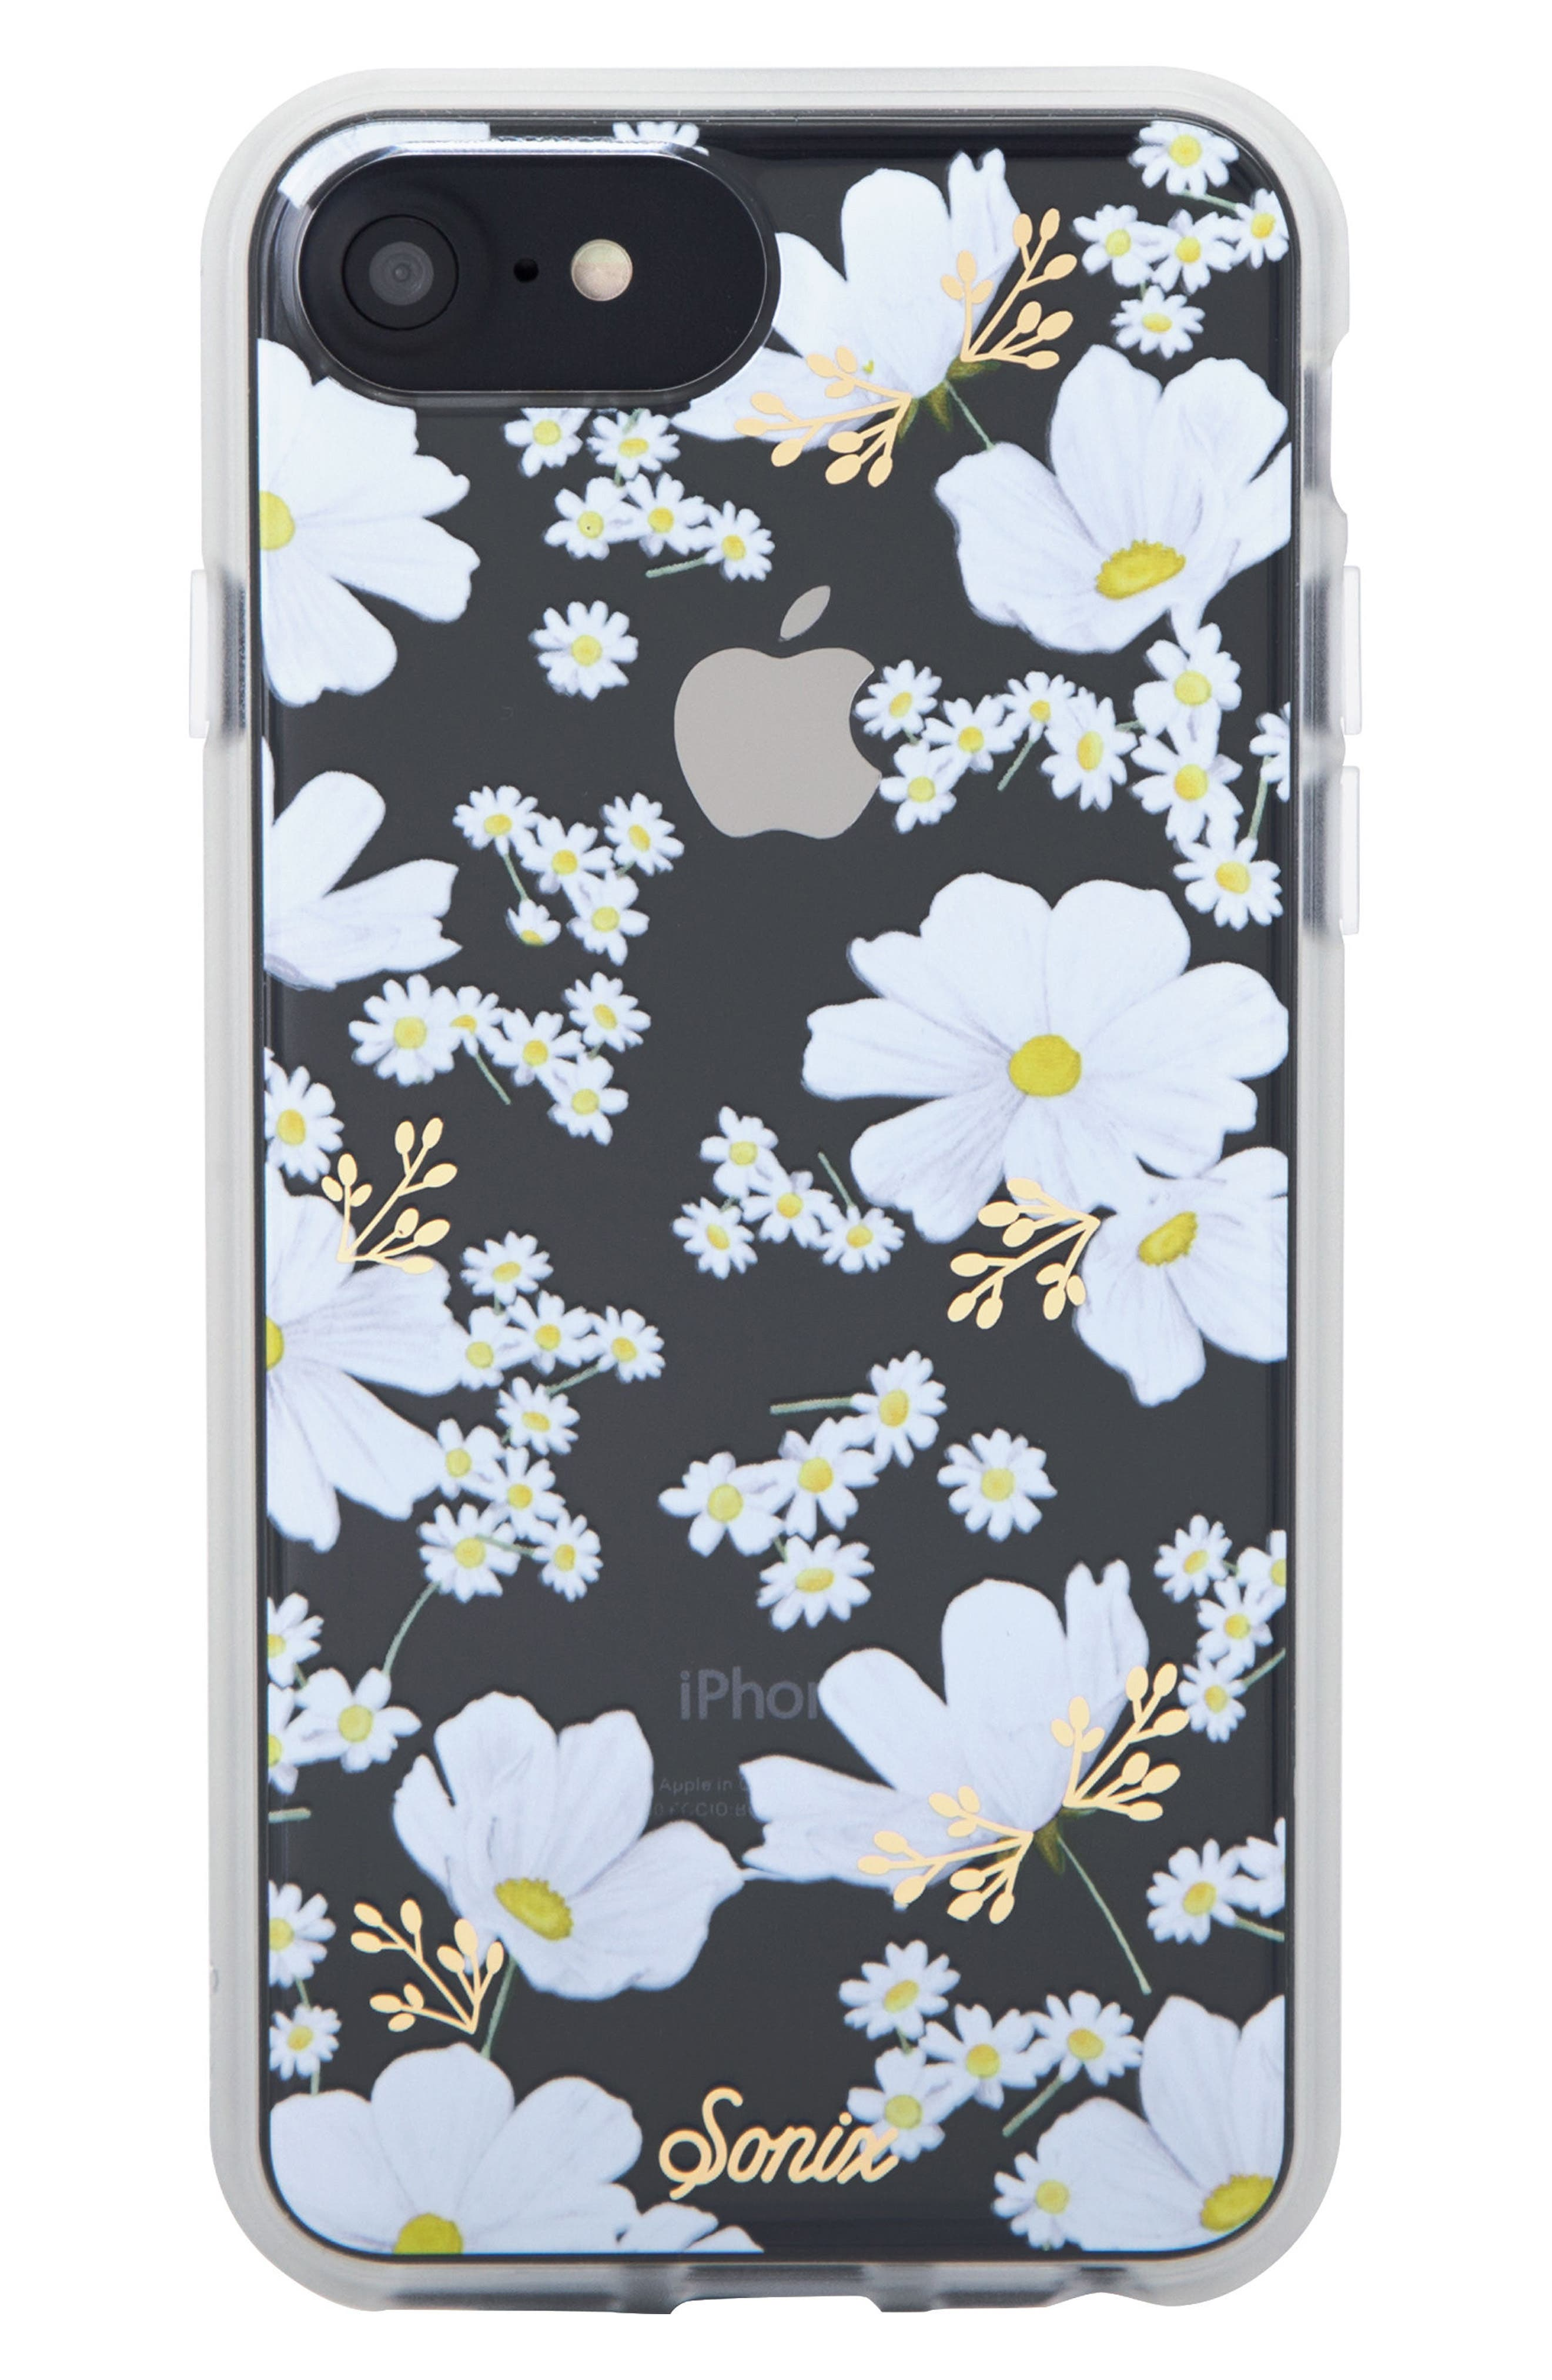 Sonix Ditsy Daisy iPhone 6 /6S/7/8 & 6/6s7/8 Plus Case